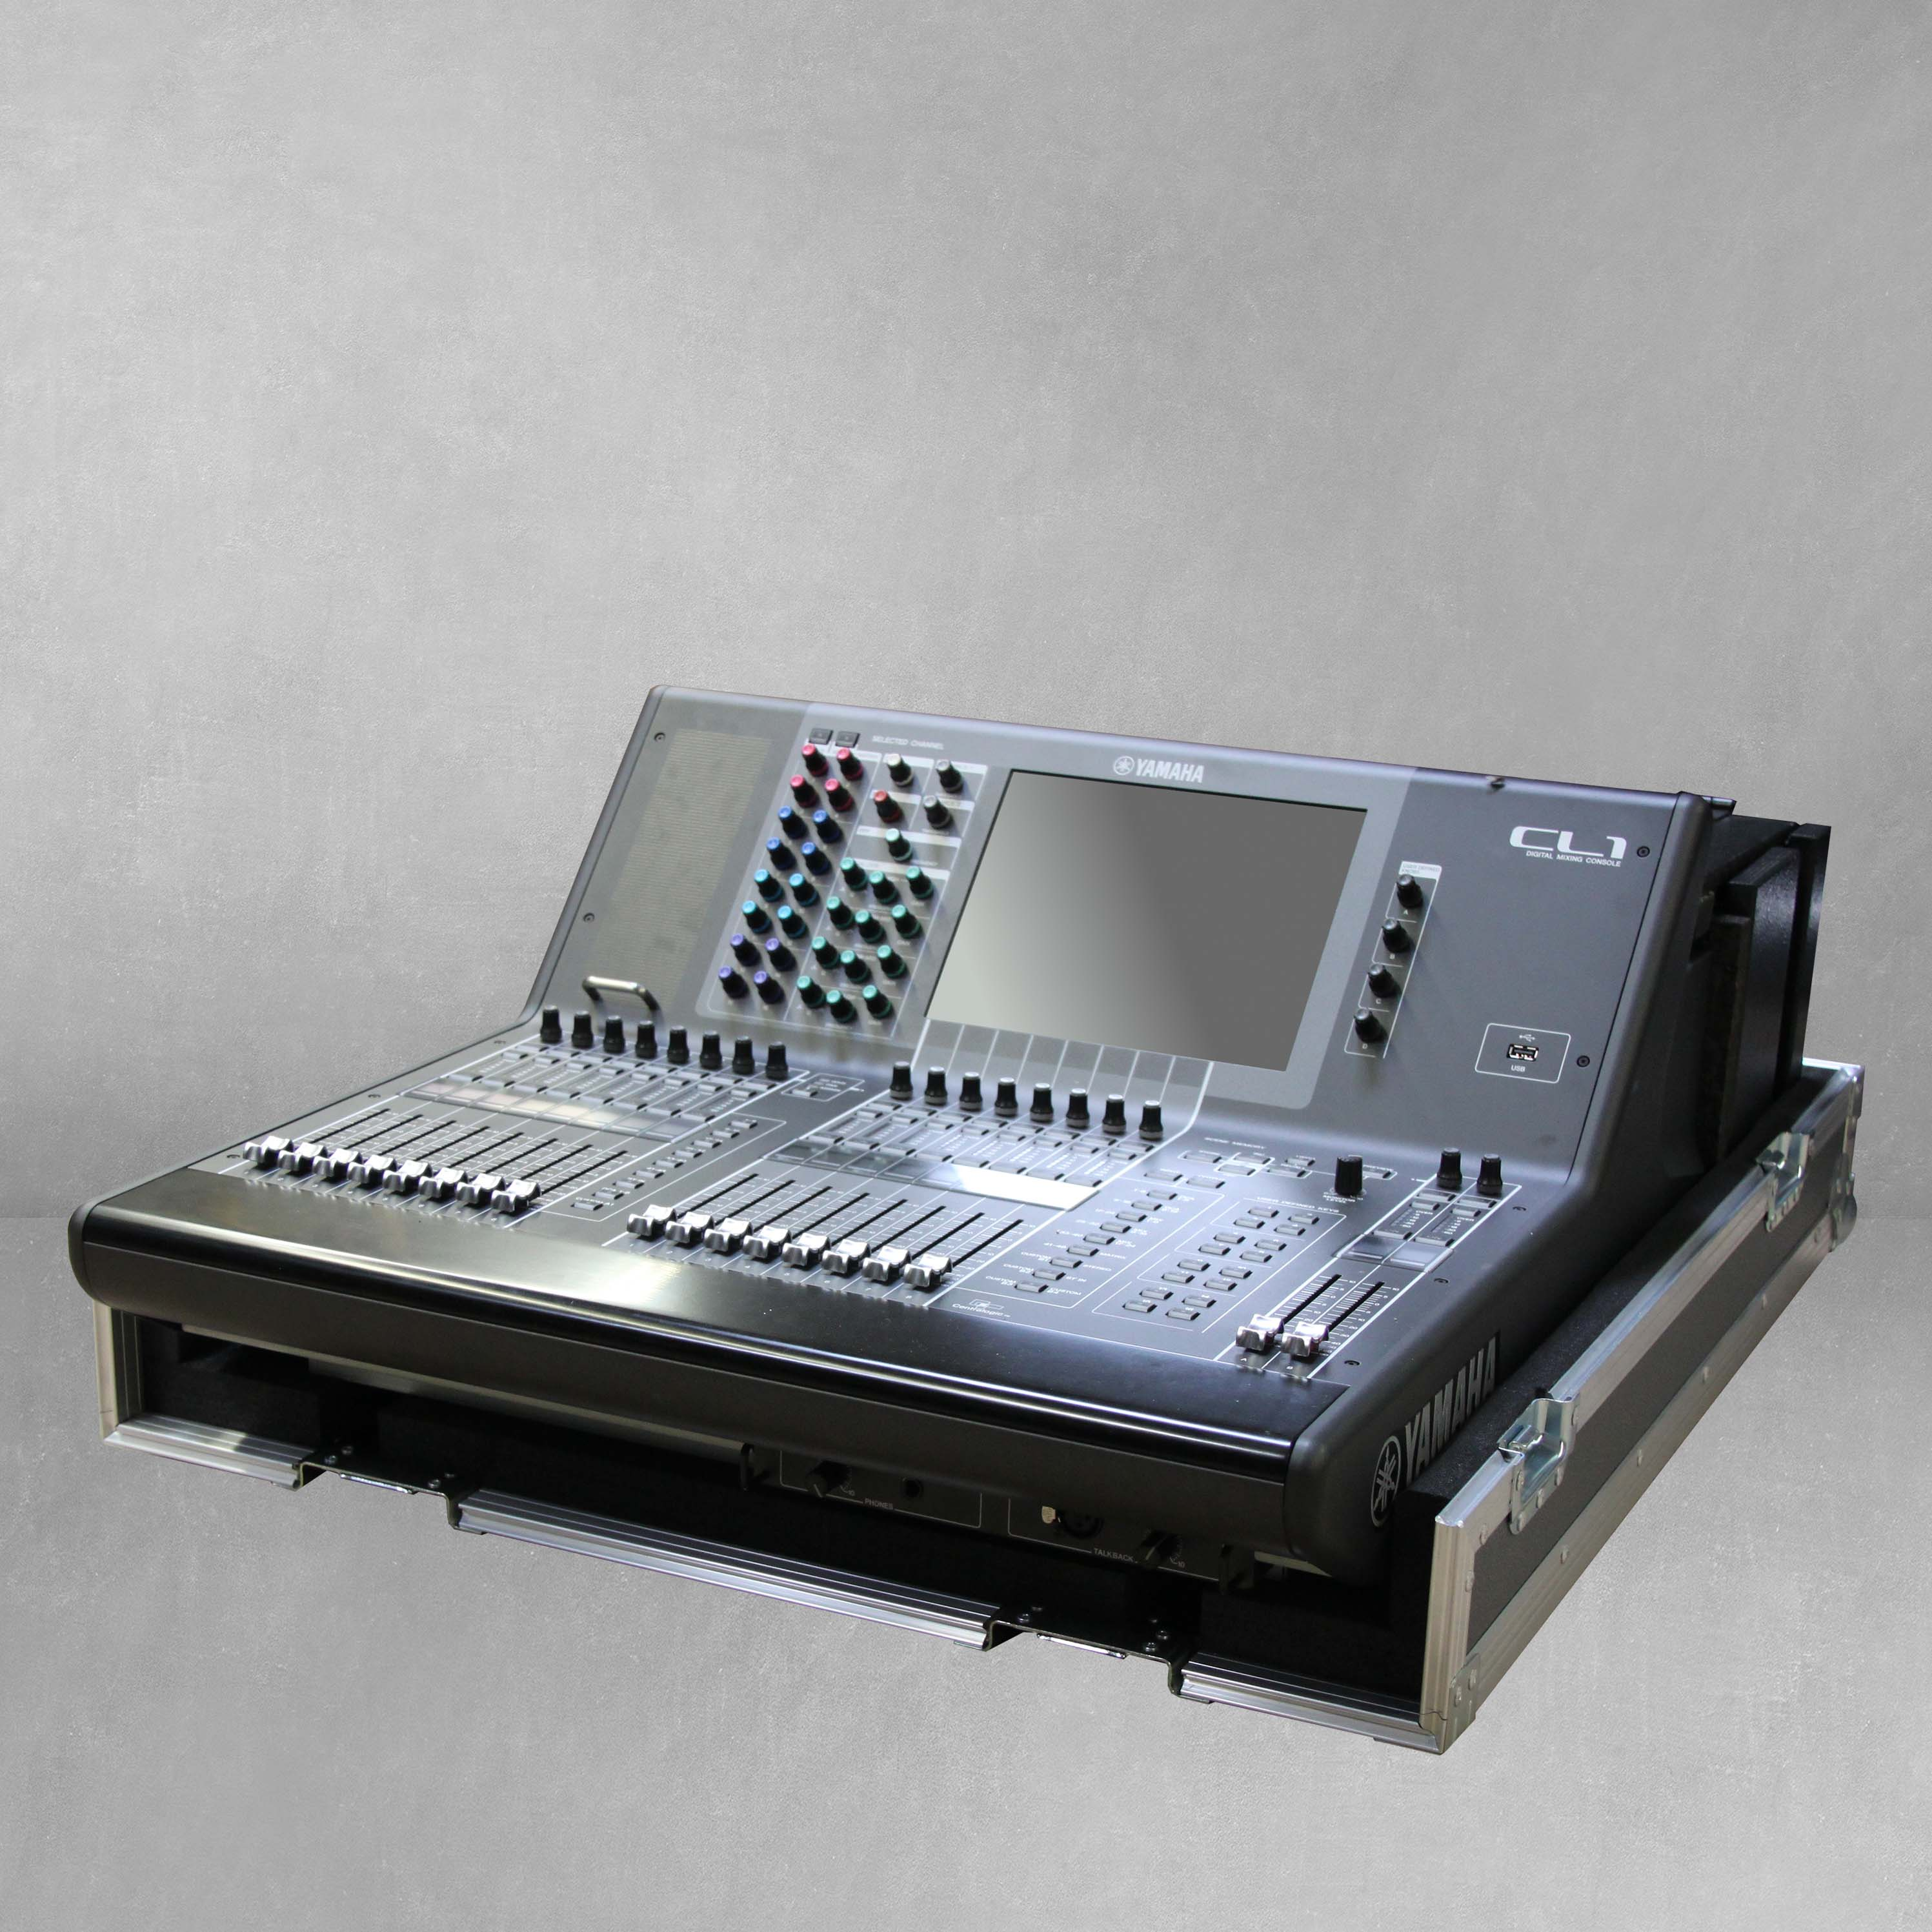 Haubencase für Yamaha CL1 (ohne Meterbridge)